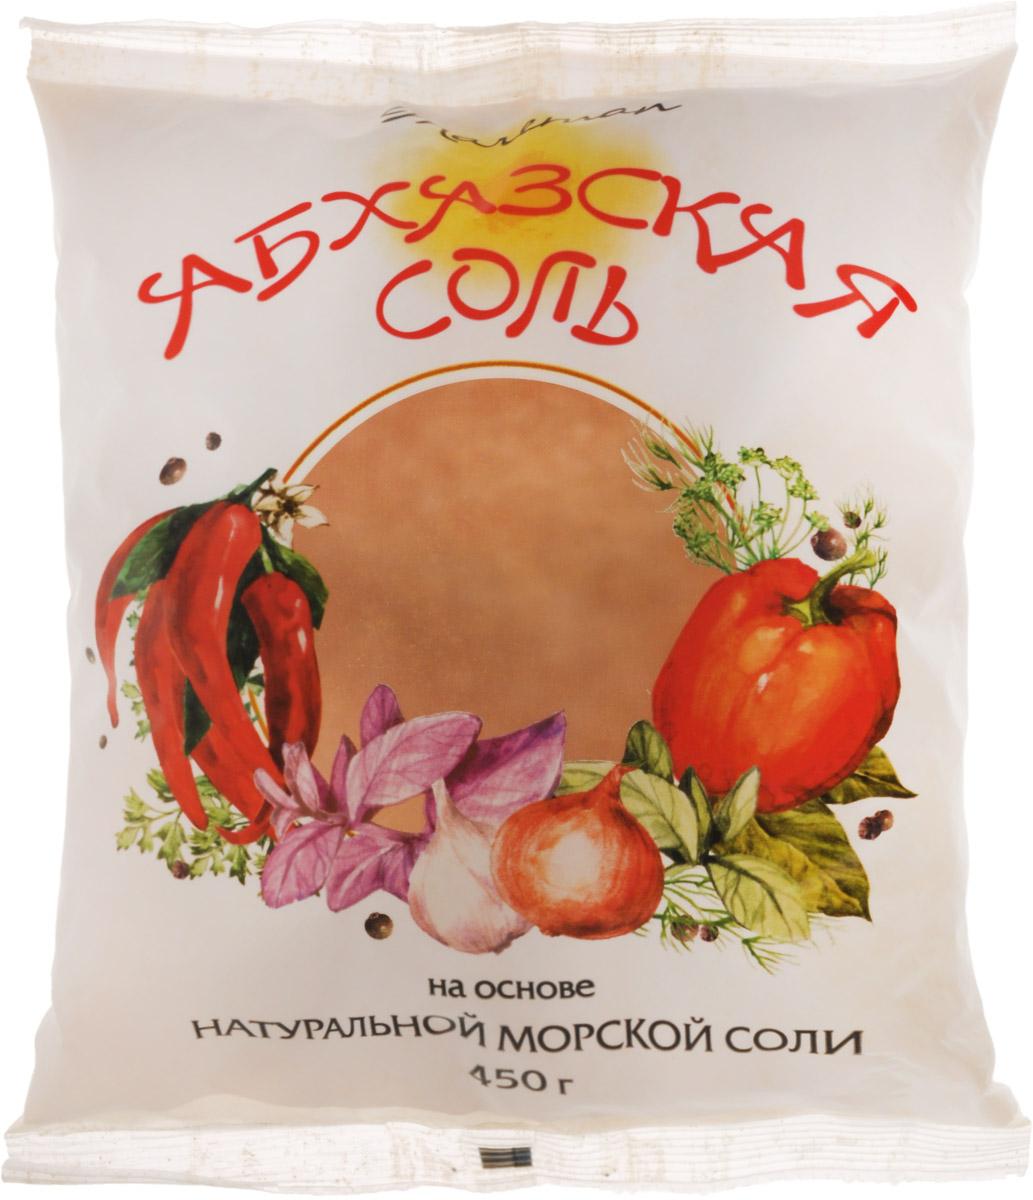 Mareman соль Абхазская, 450 г соляной бочонок соль для запекания рыбы 450 г